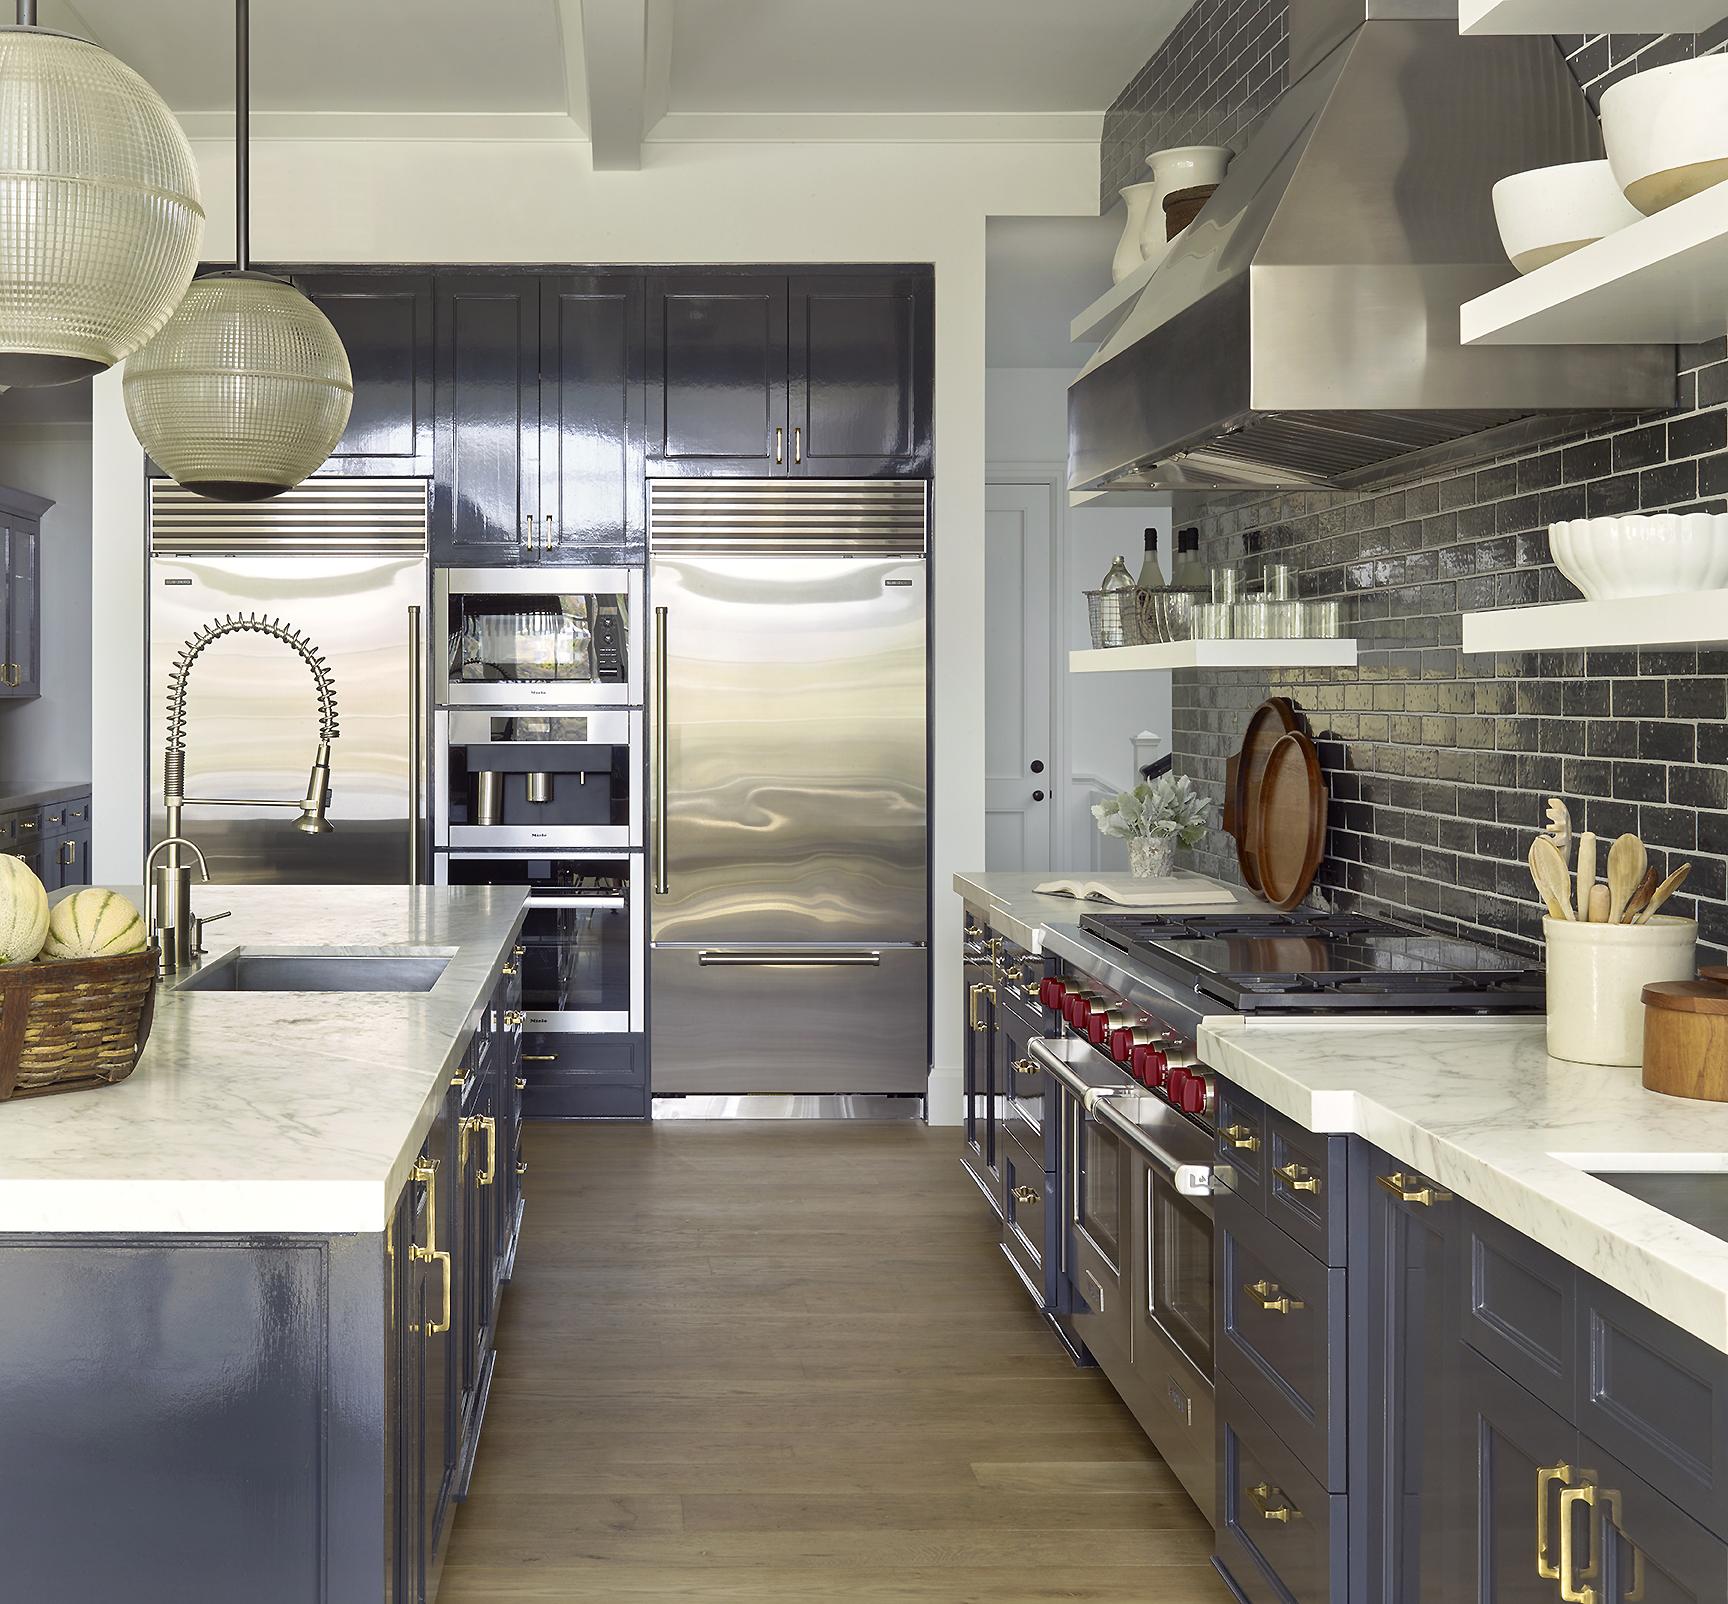 Pacific Palisades kitchen by Dan Scotti Design